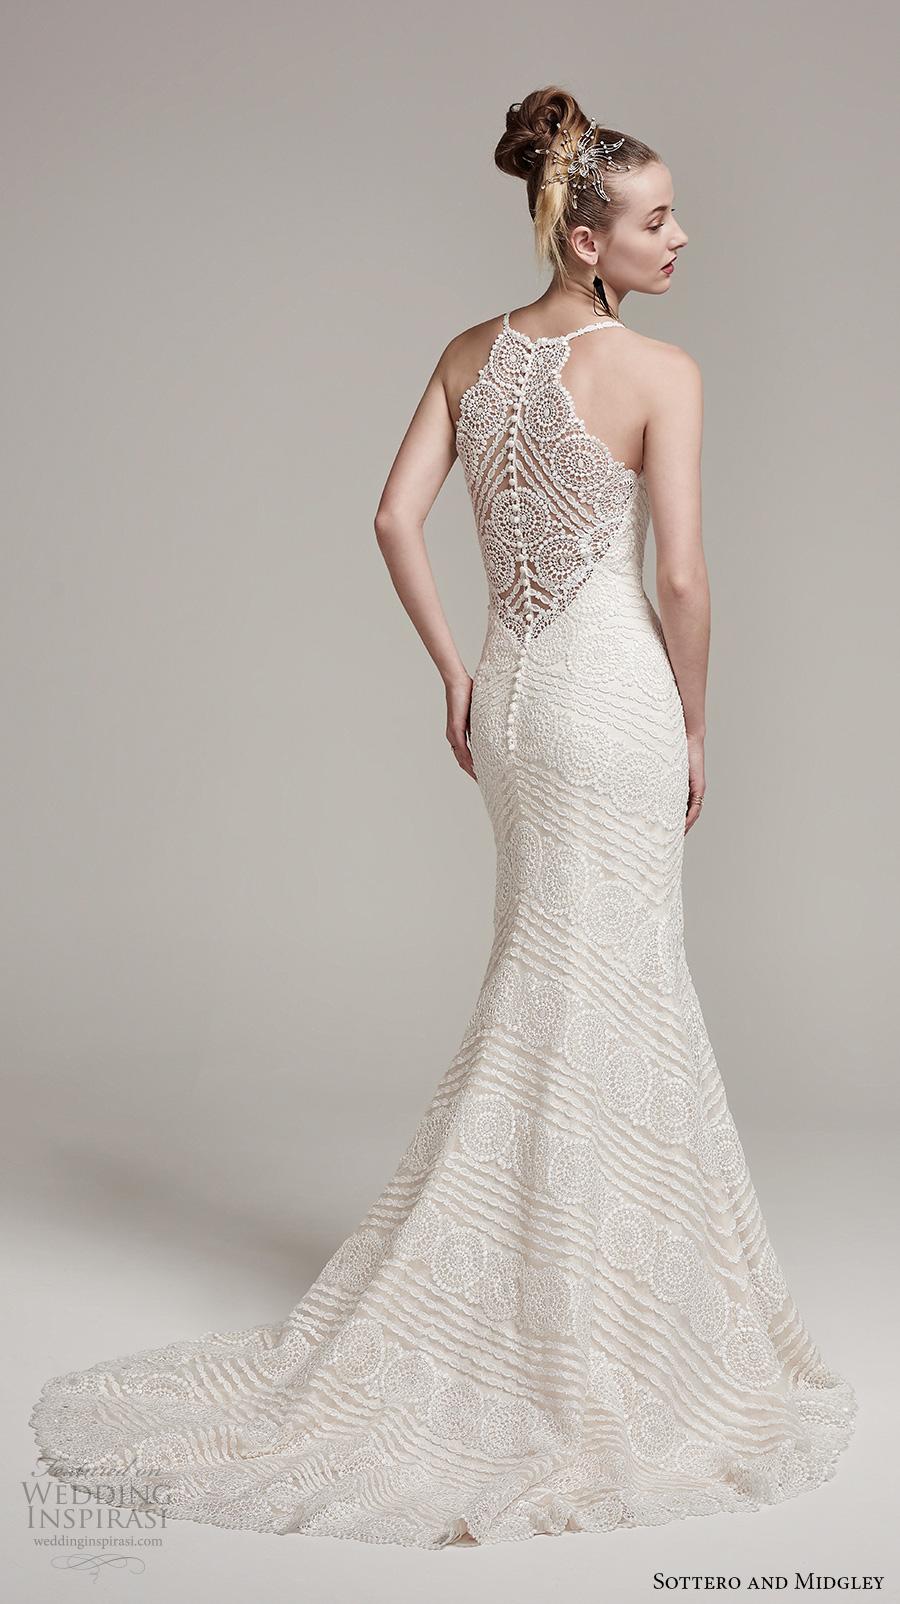 Sottero and Midgley Fall 2016 Wedding Dresses  Amlie Bridal Collection  Wedding Inspirasi